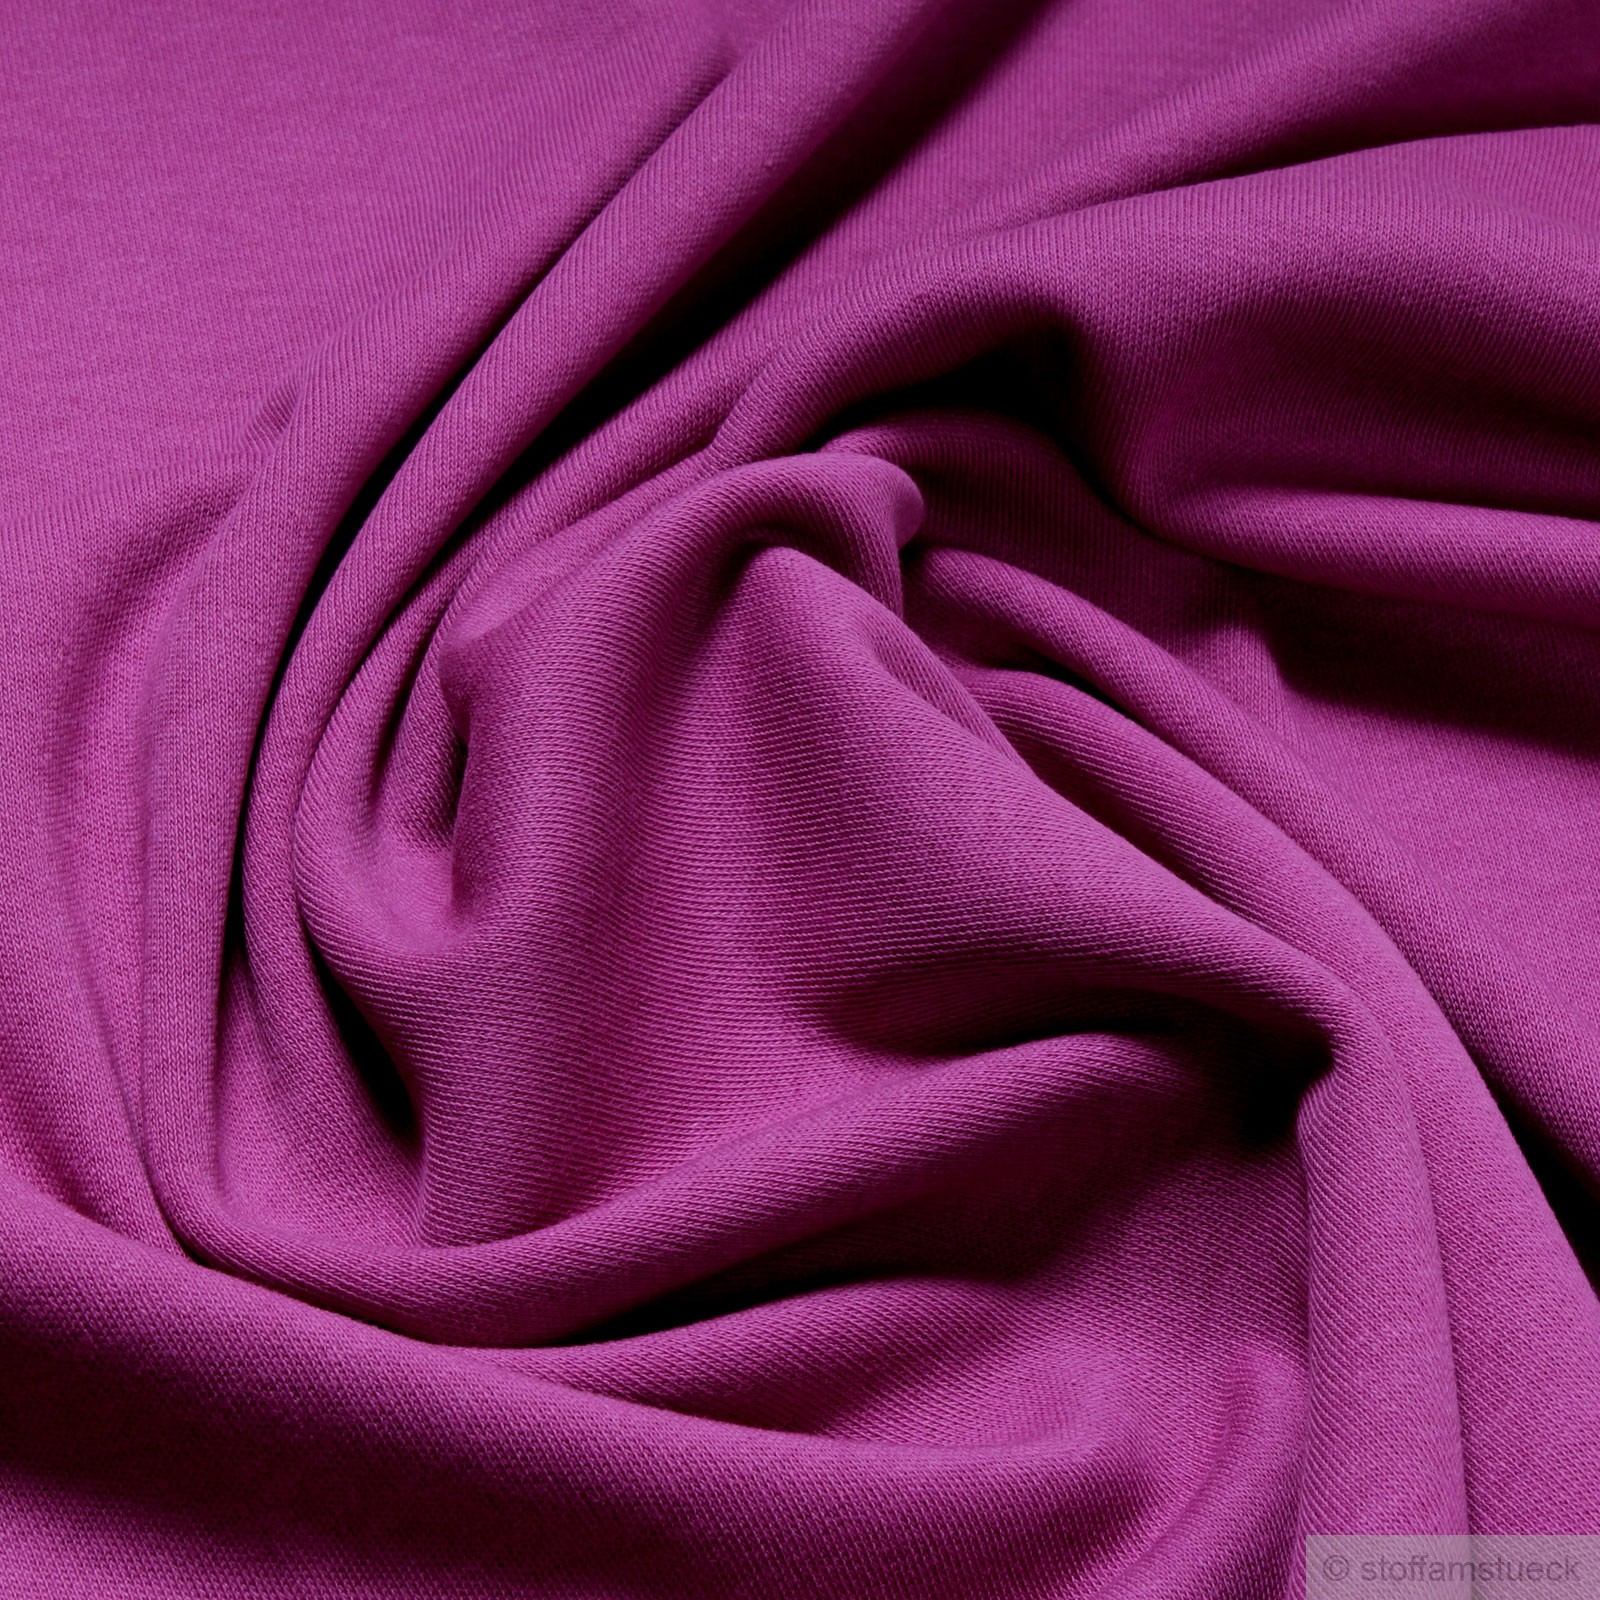 Decke Farbe Fuchsia: Baumwolle Interlock Jersey Fuchsia Farbe Farbe Lila / Pink